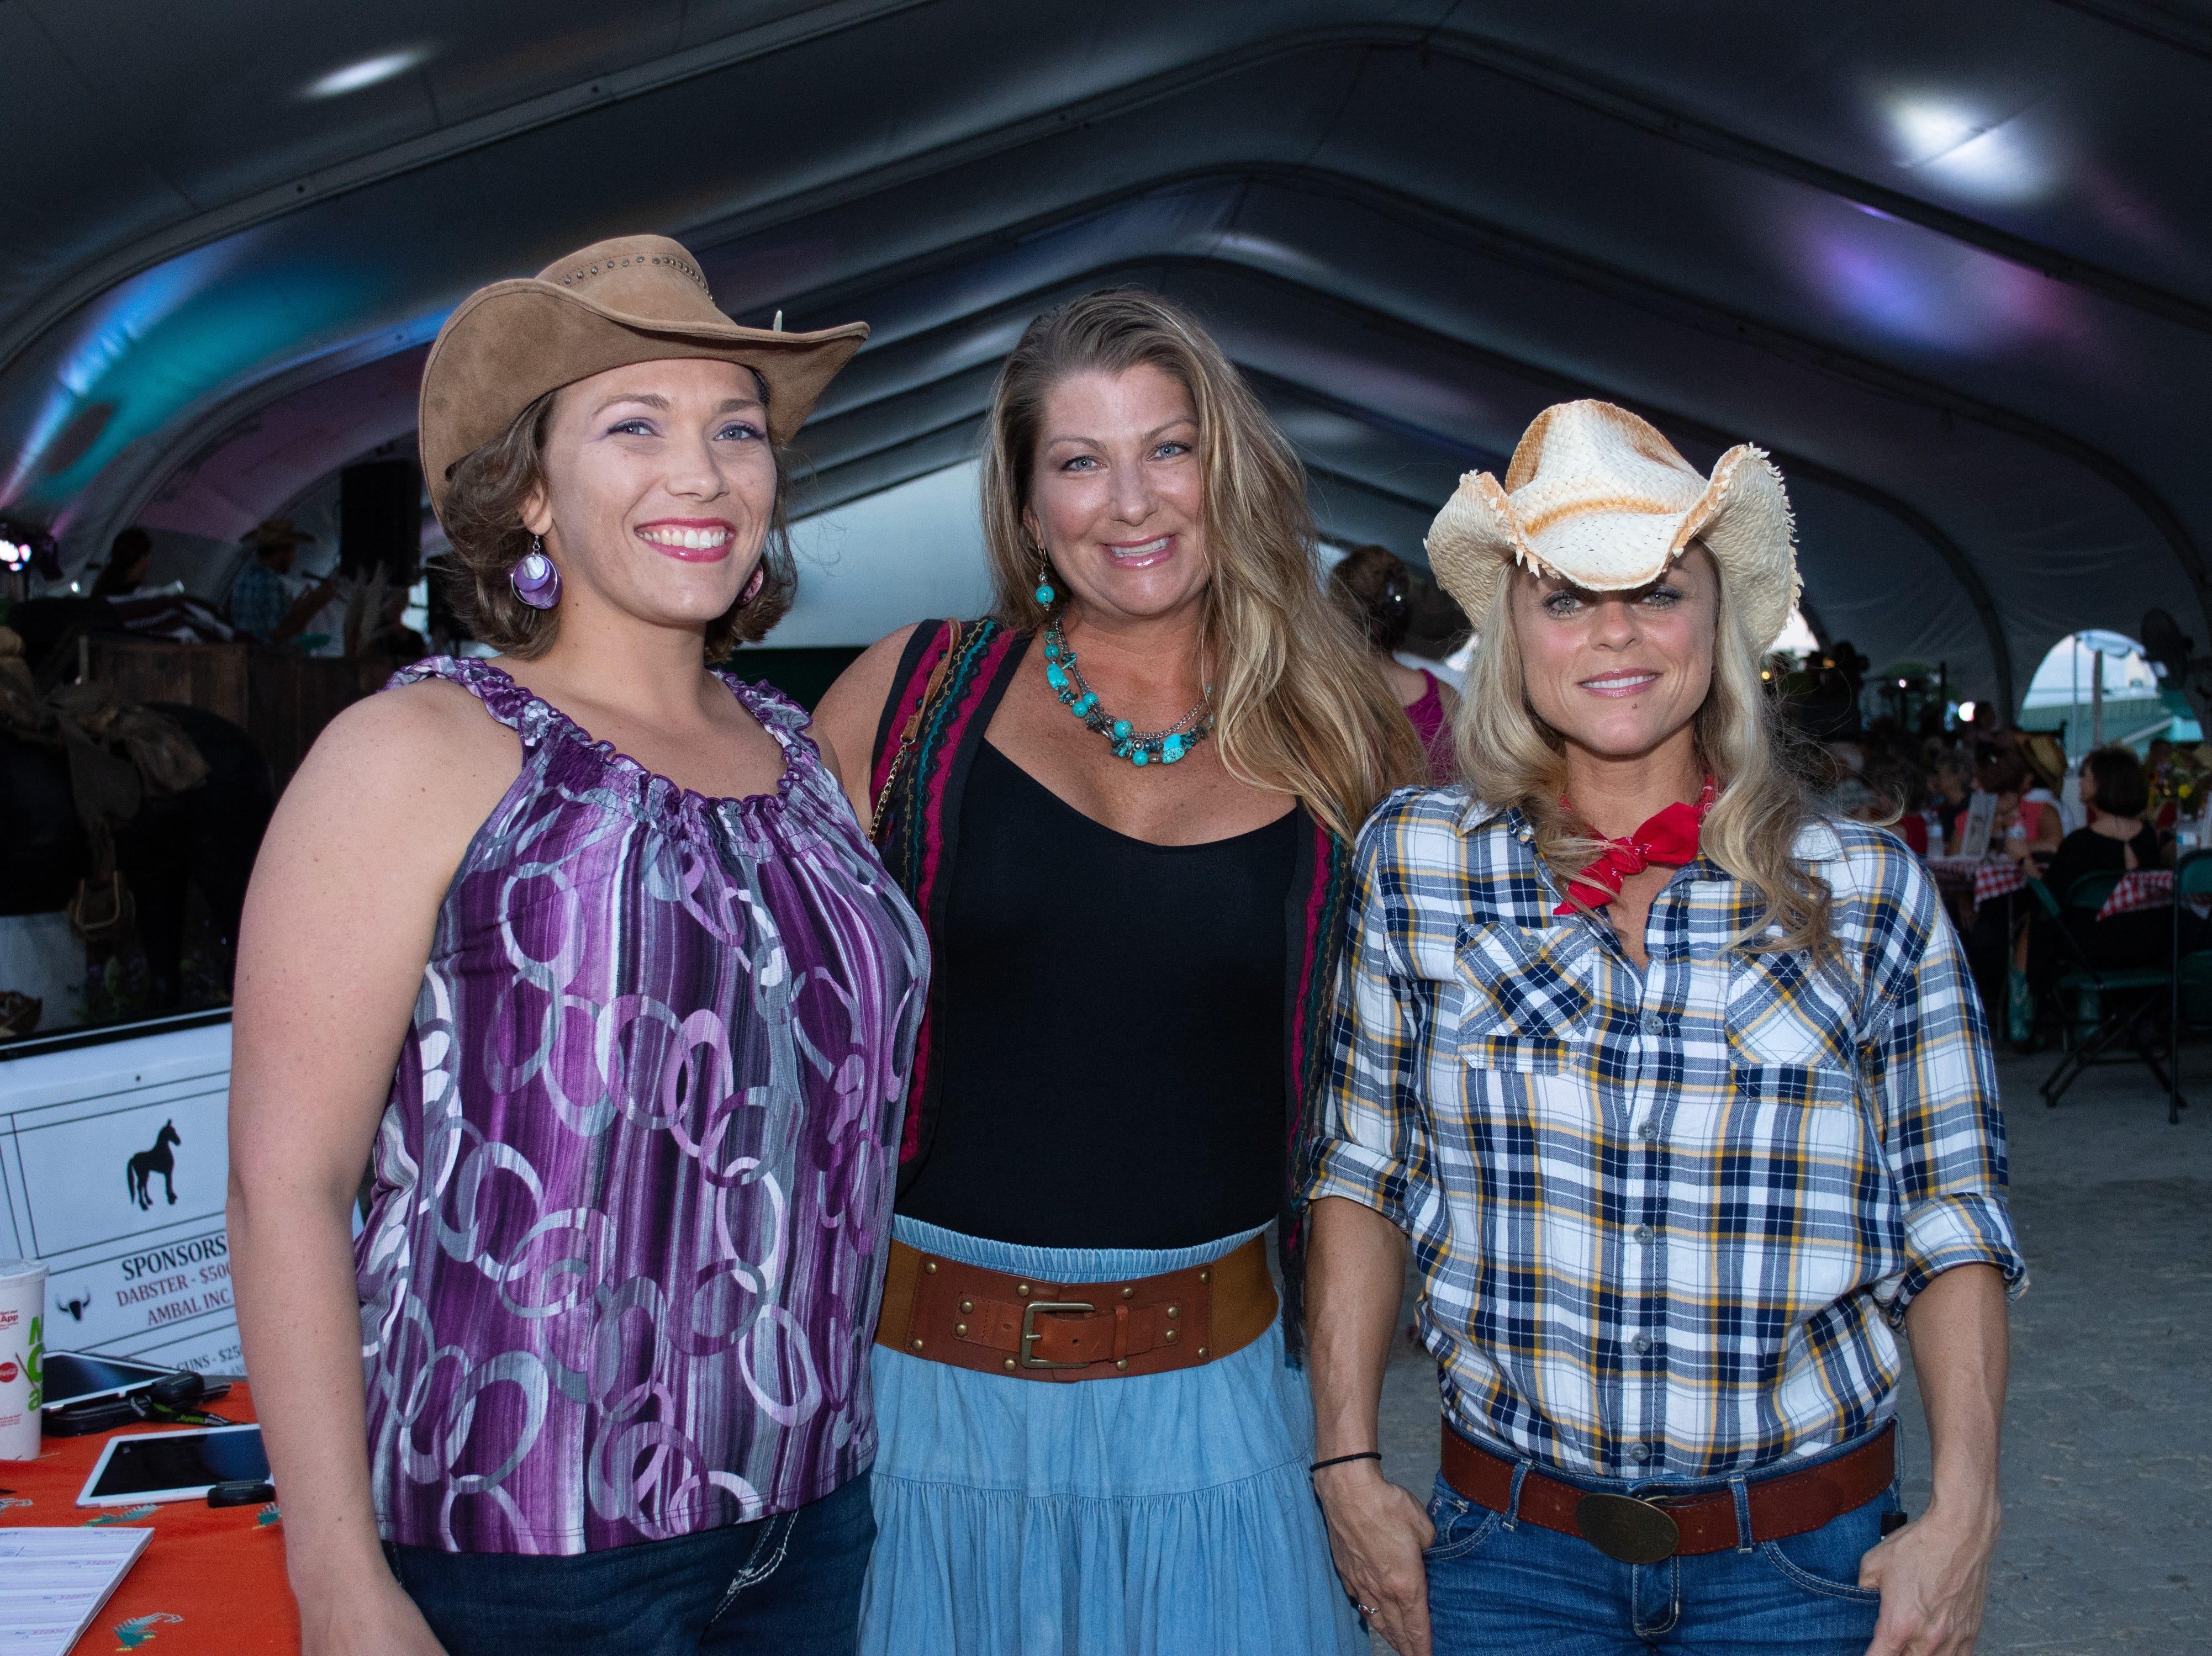 Rebecca Chapman, Allison Stauffer, and Teresa Morgan pose for a photo. Arron Lampkin/For FLORIDA TODAY